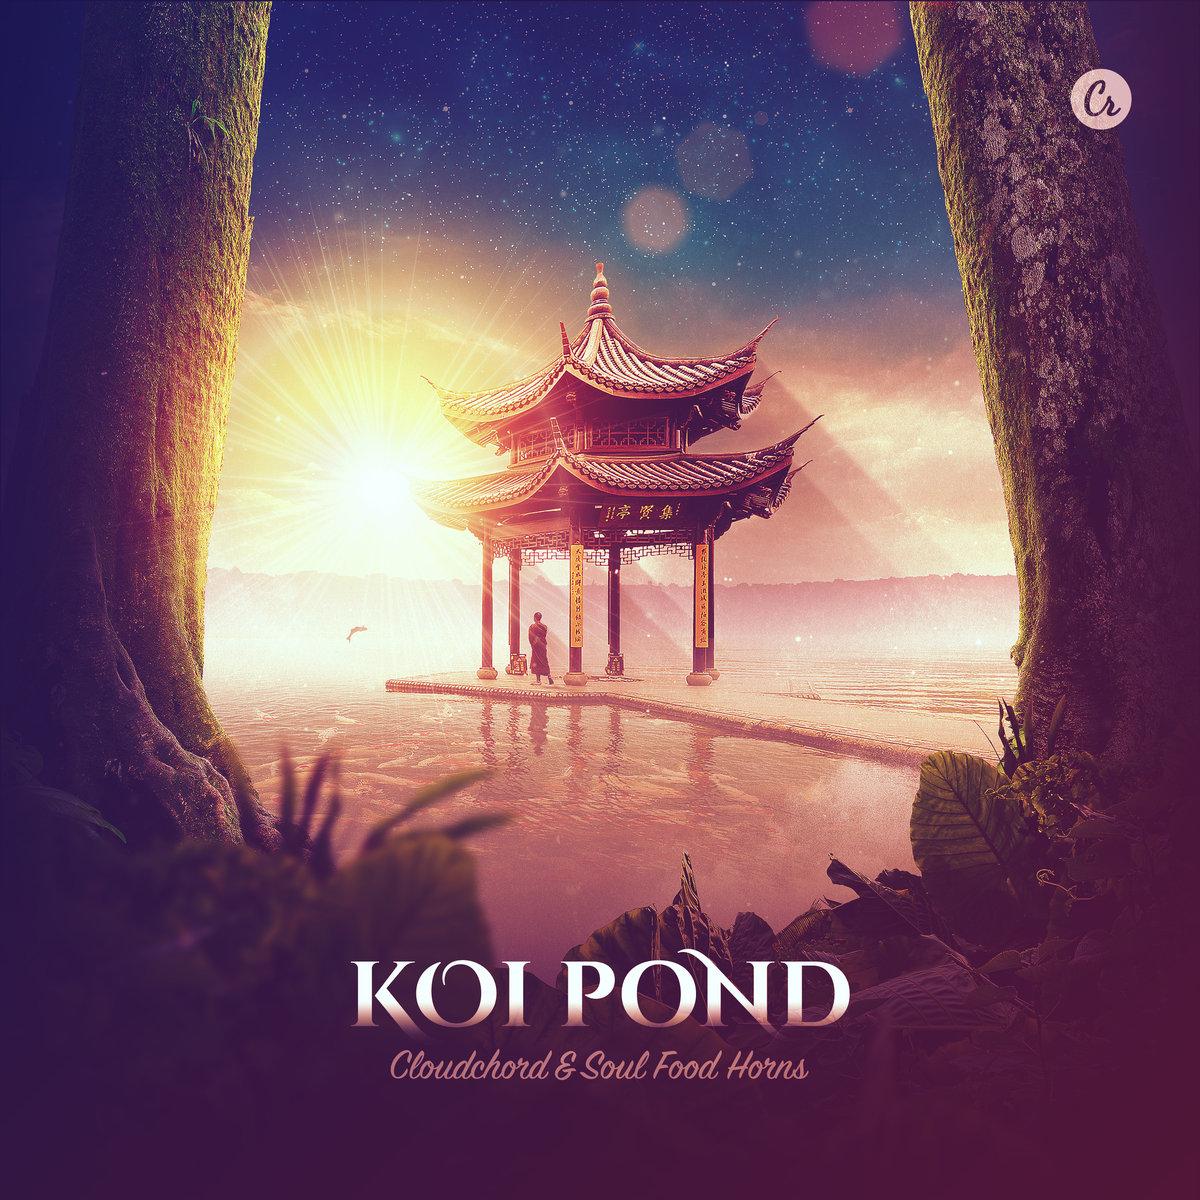 Koi Pond von Cloudchord & Soul Food Horns | Der Chill Hop Soundtrack für gutes Wetter